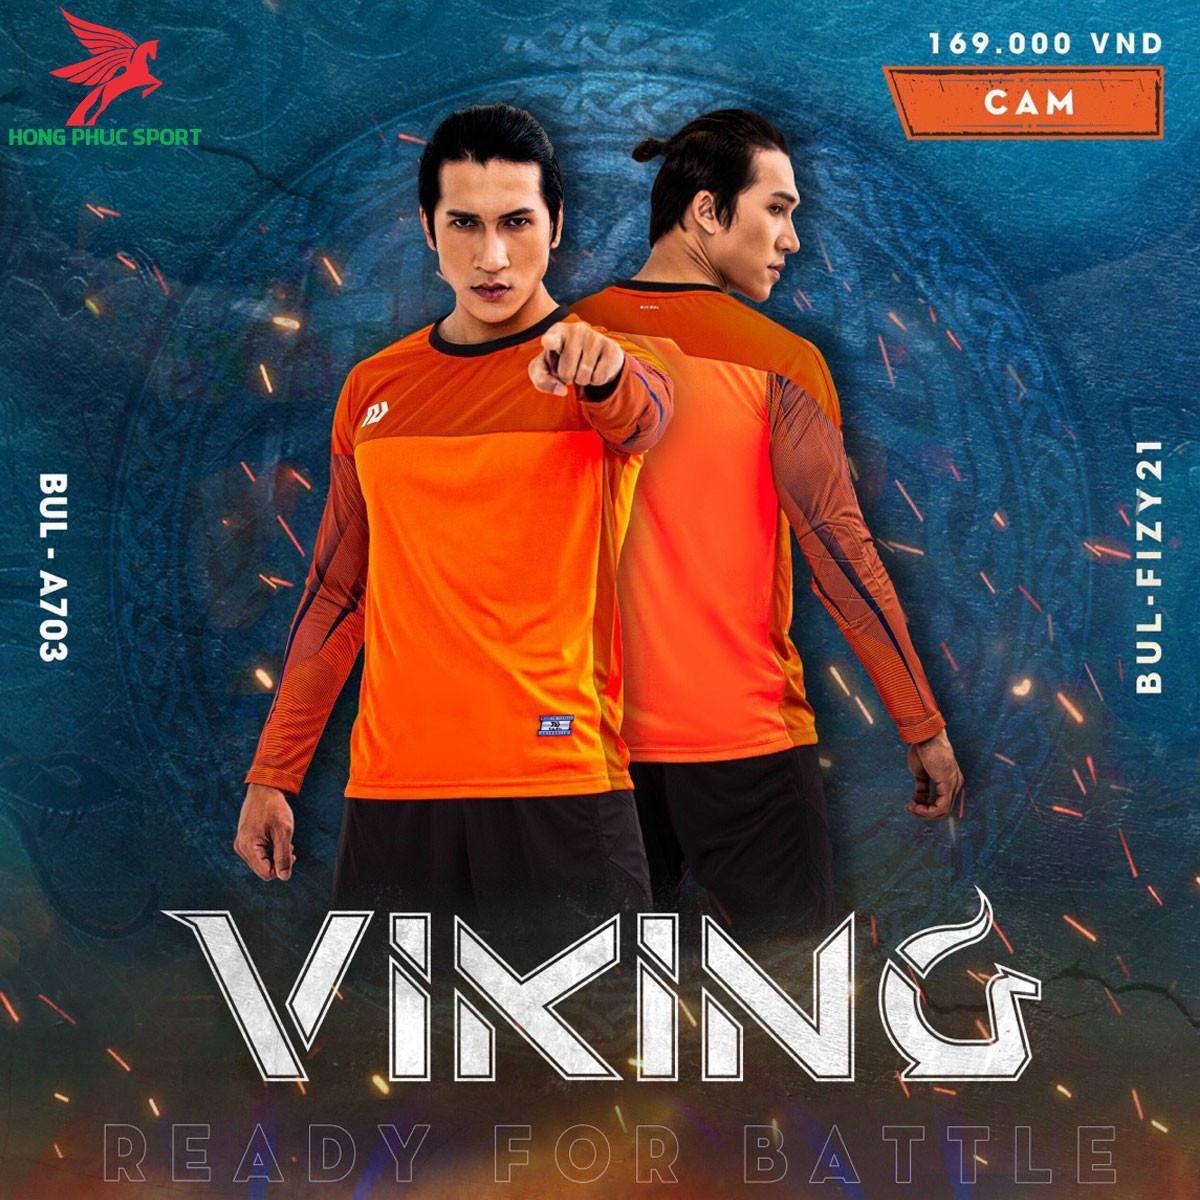 https://cdn.hongphucsport.com/unsafe/s4.shopbay.vn/files/285/ao-thu-mon-khong-logo-bulbal-viking-mau-cam-60515cd7aa800.jpg